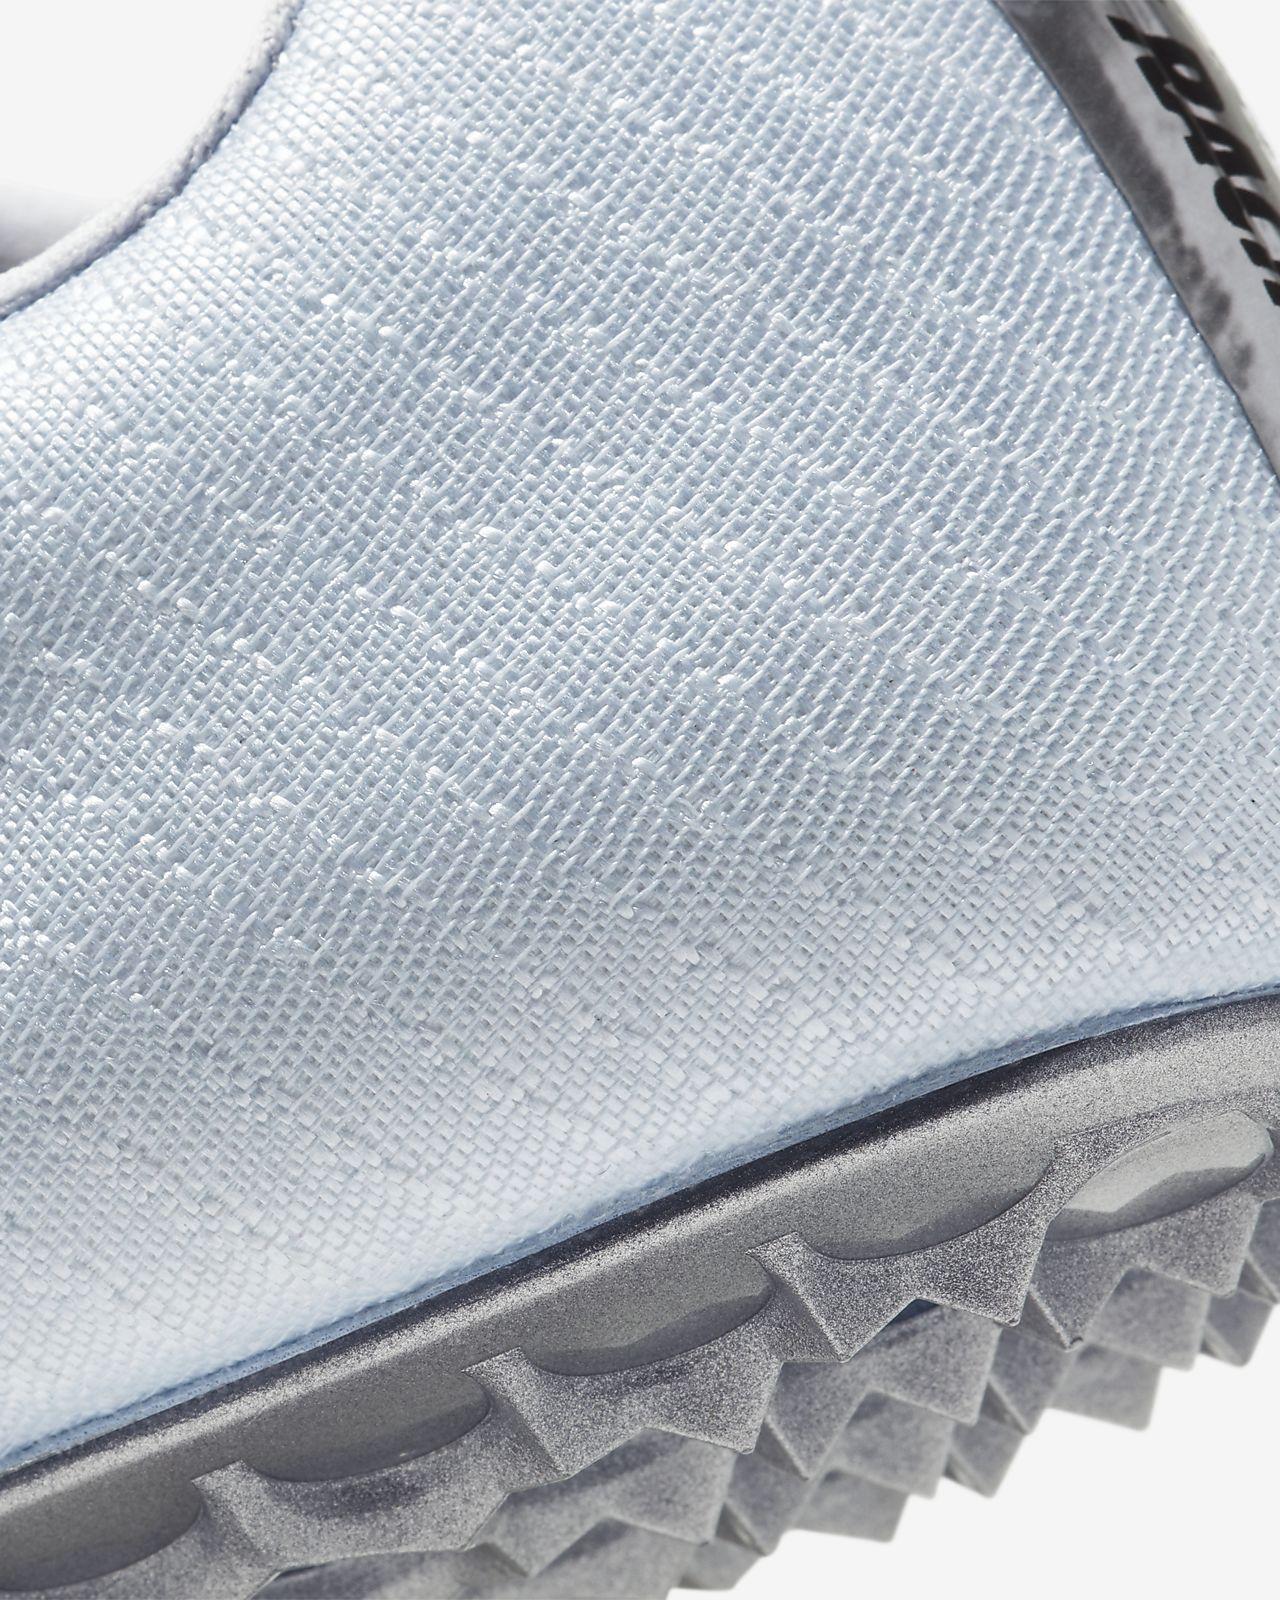 Scarpa chiodata da gara Nike Superfly Elite